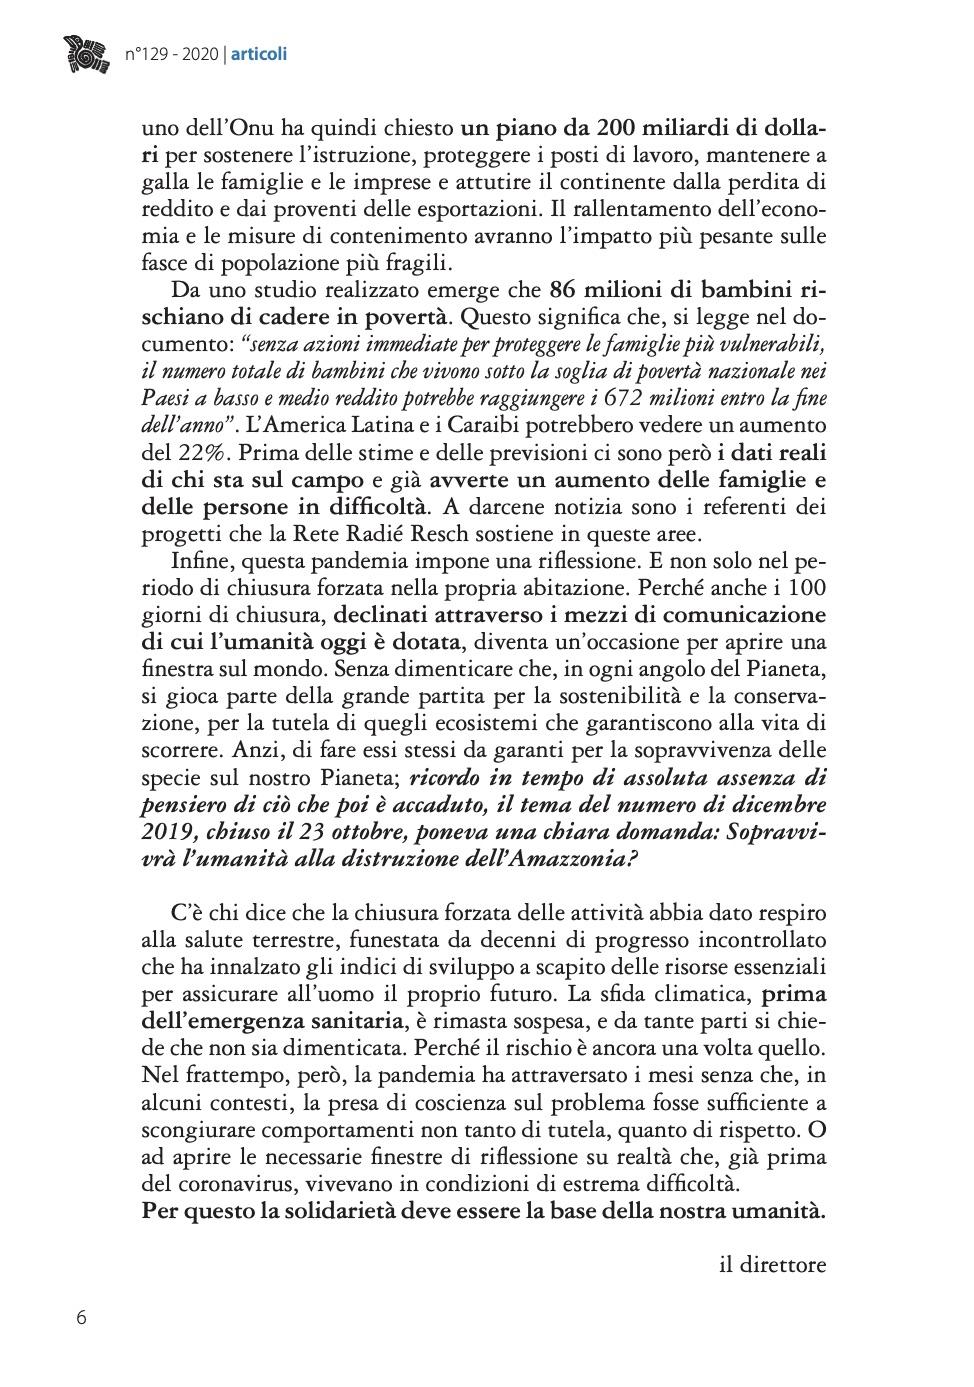 editoriale3.jpg